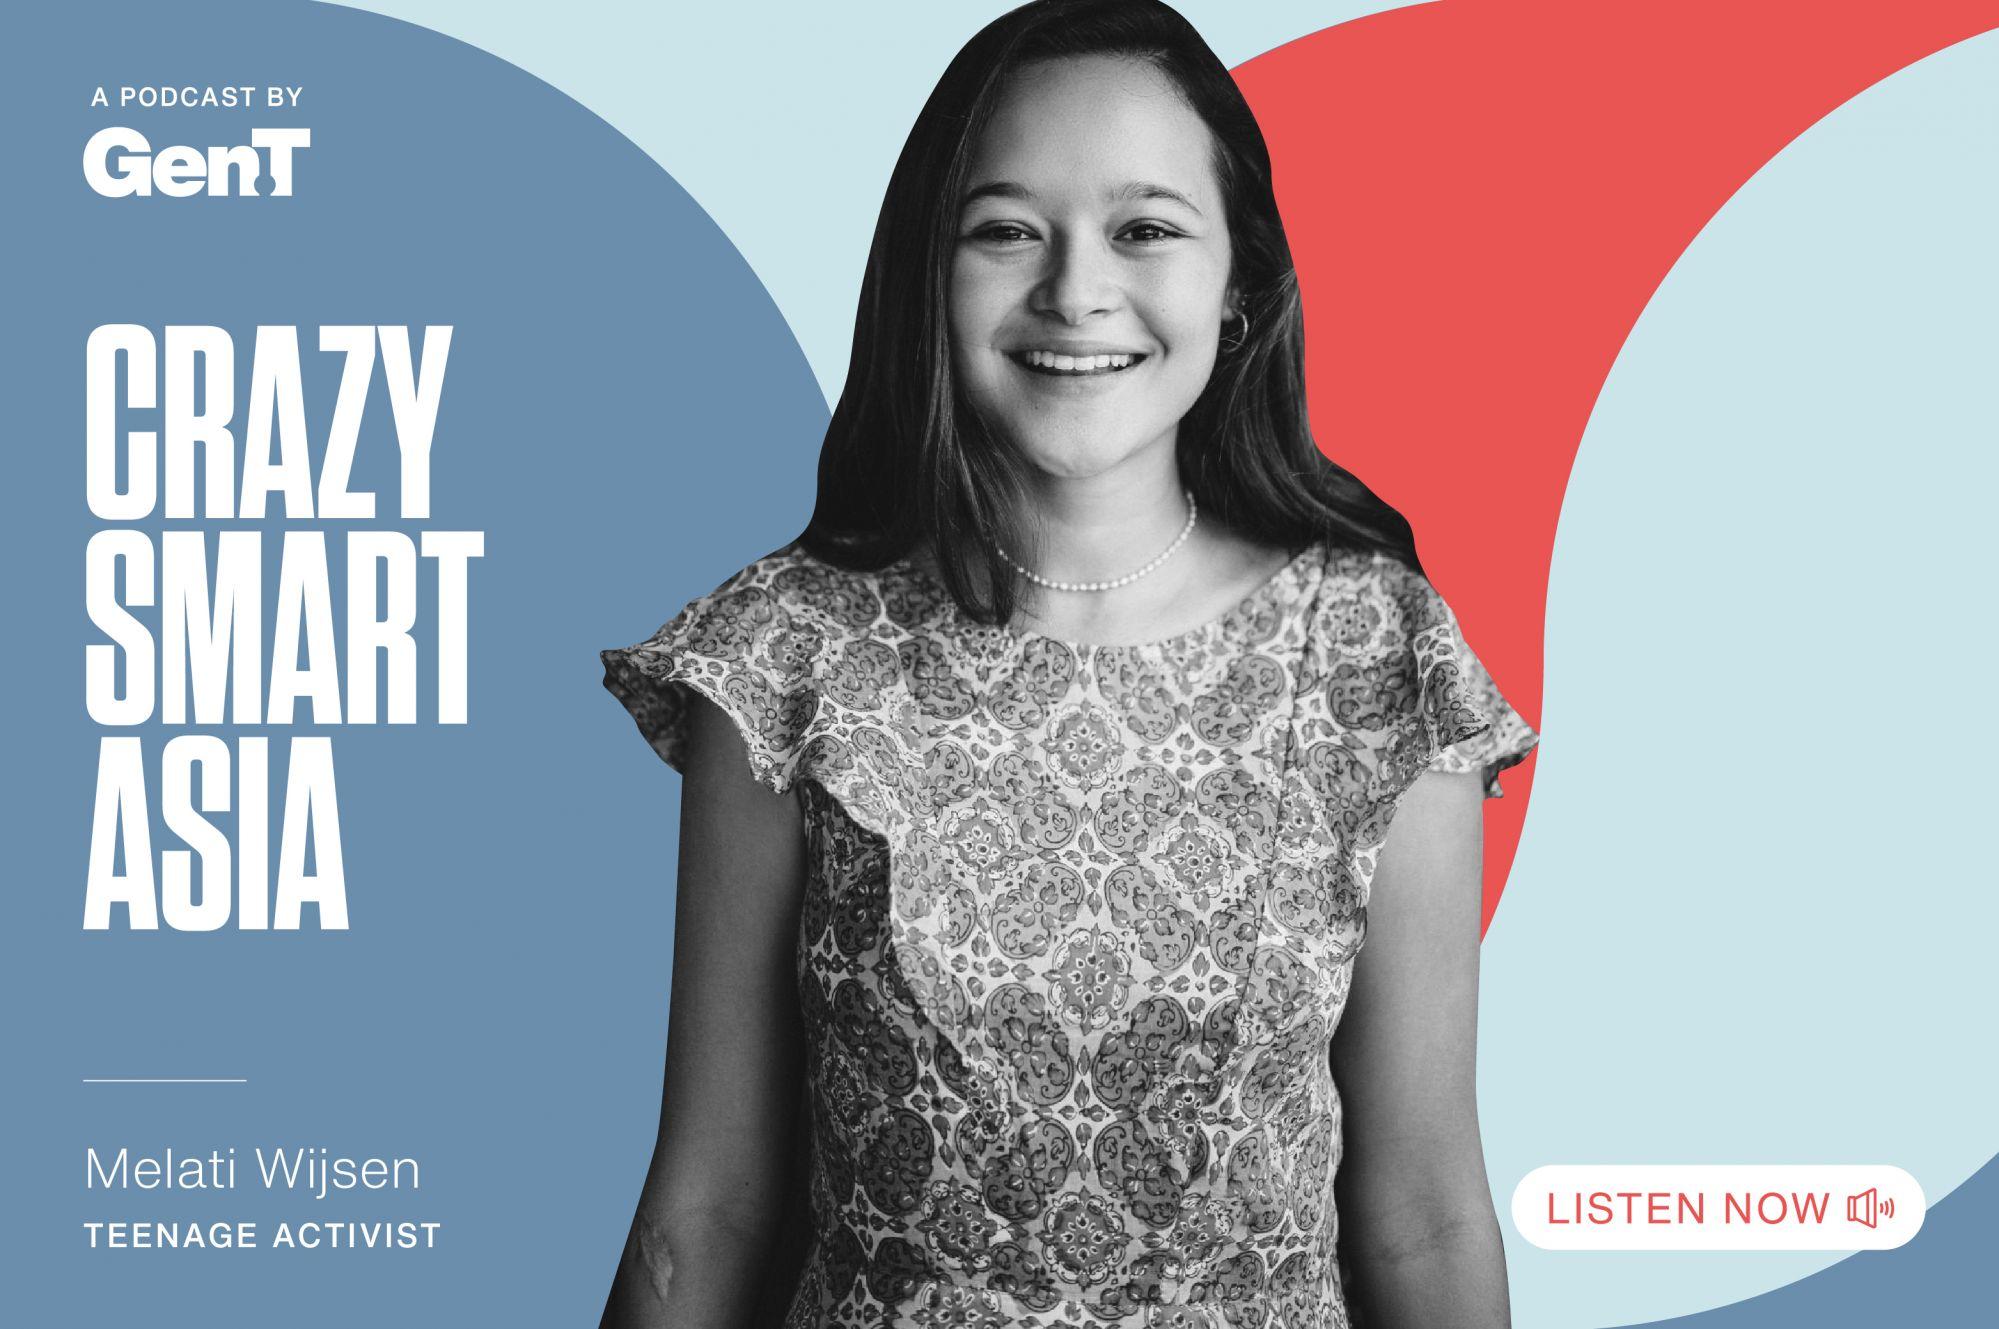 Crazy Smart Asia: Melati Wijsen—The Teenager Changing The World